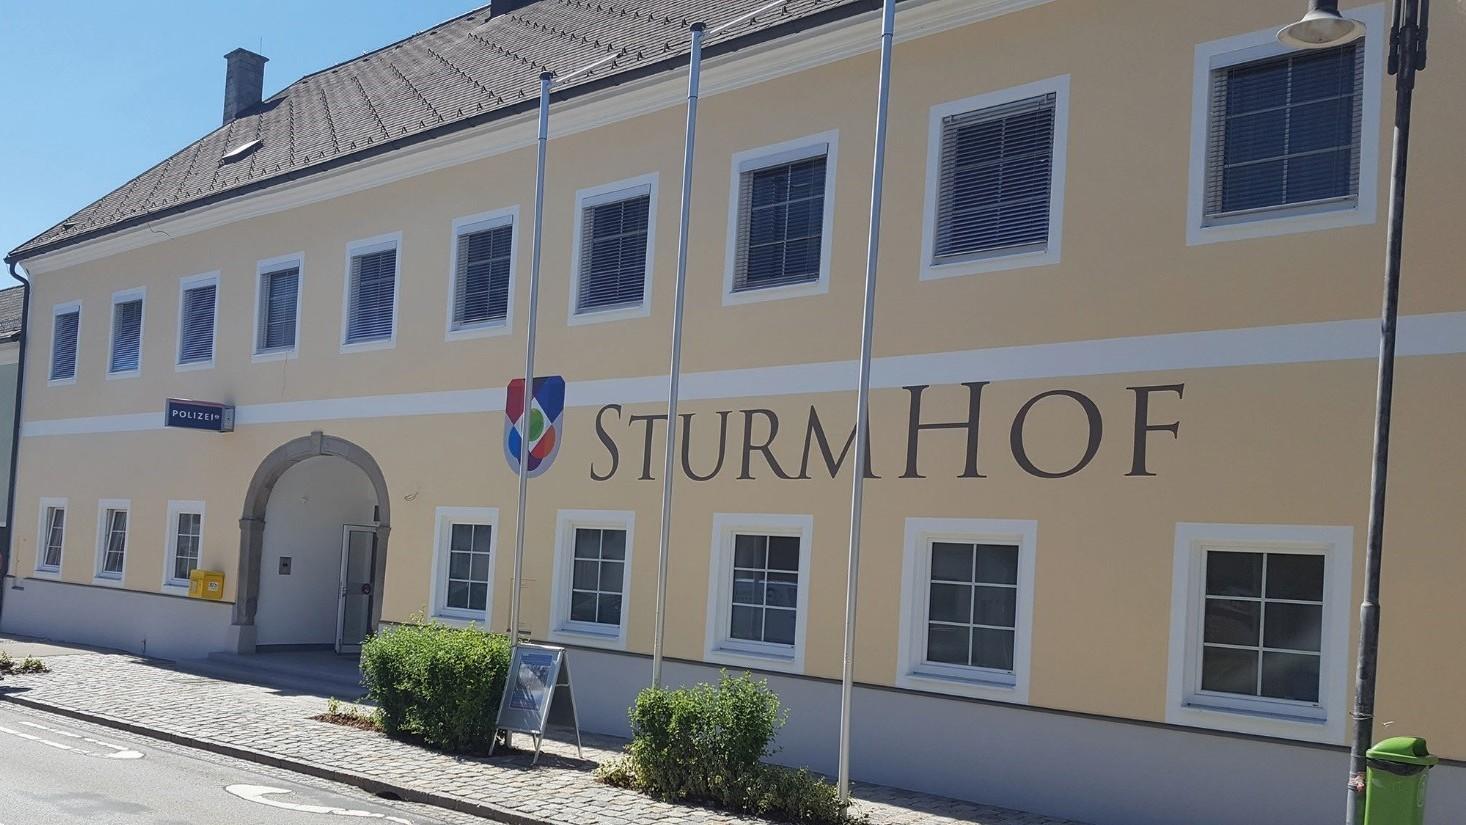 Sturmhof_2.jpg